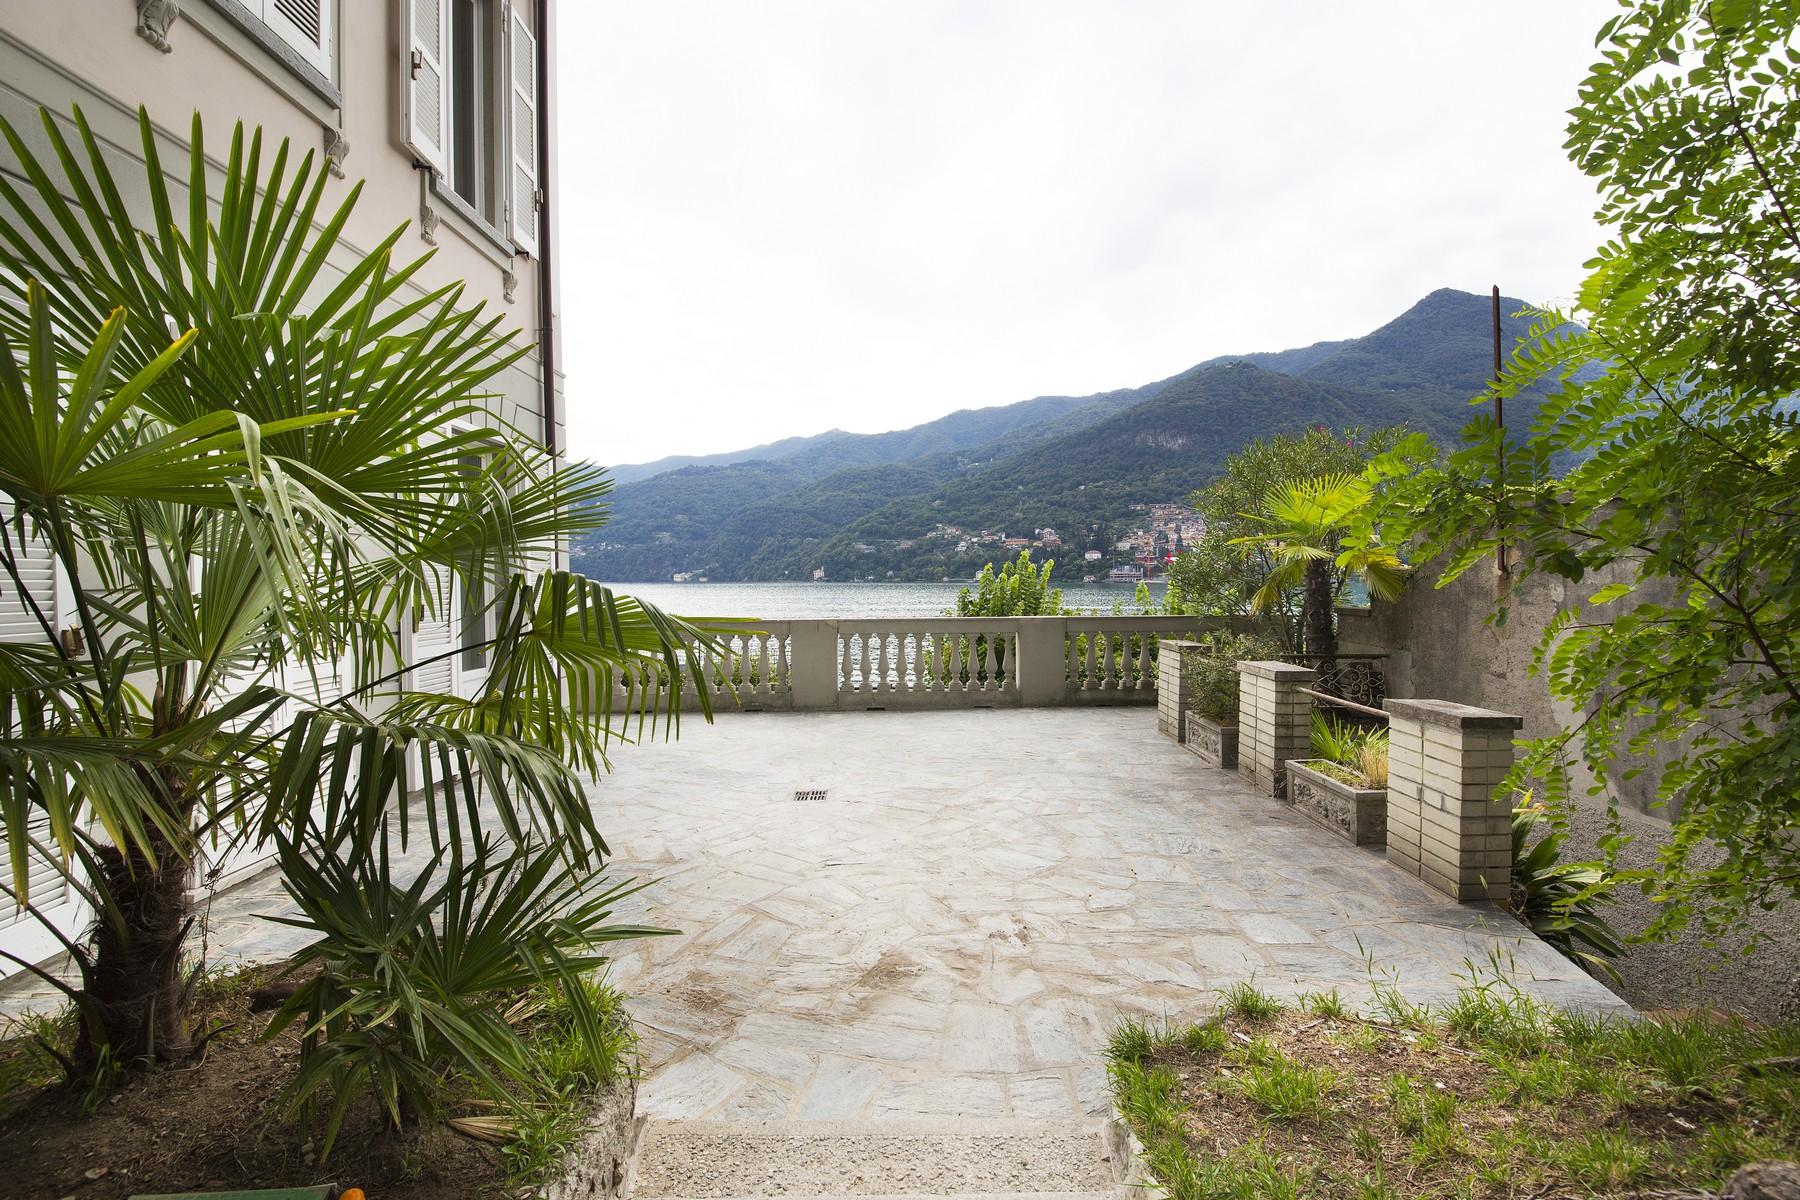 Villa in Vendita a Carate Urio: 5 locali, 270 mq - Foto 4